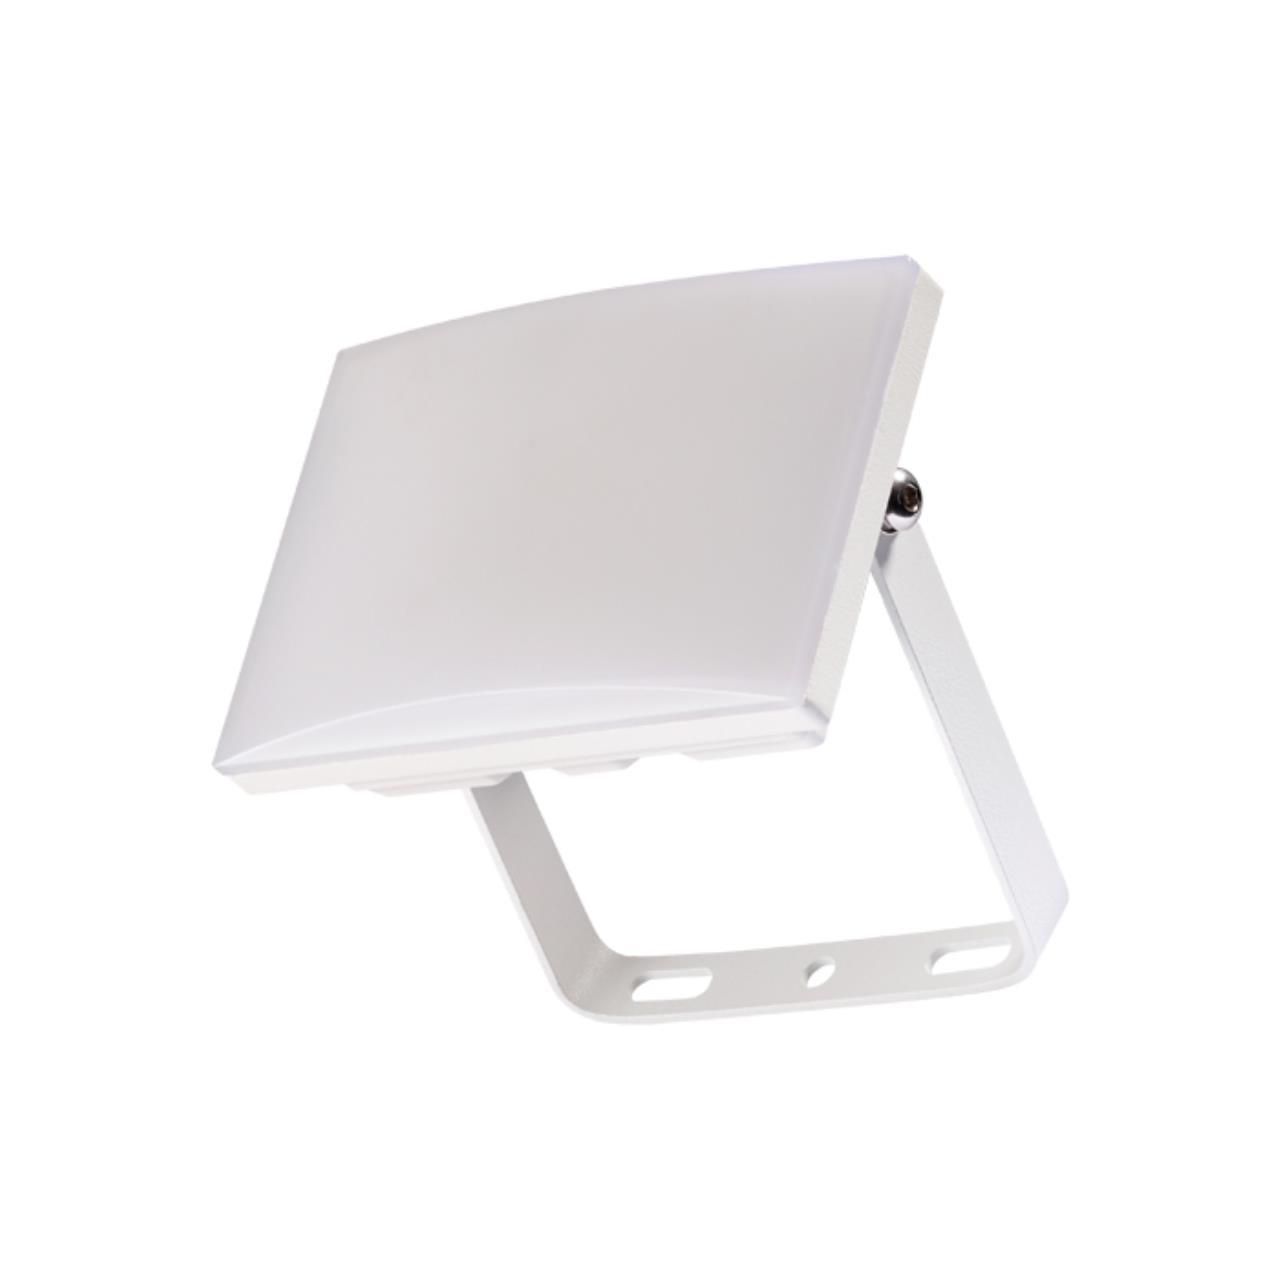 358137 STREET NT19 175 белый Светодиодный прожектор IP65 LED 4000K 10W 220 - 240V ARMIN LED